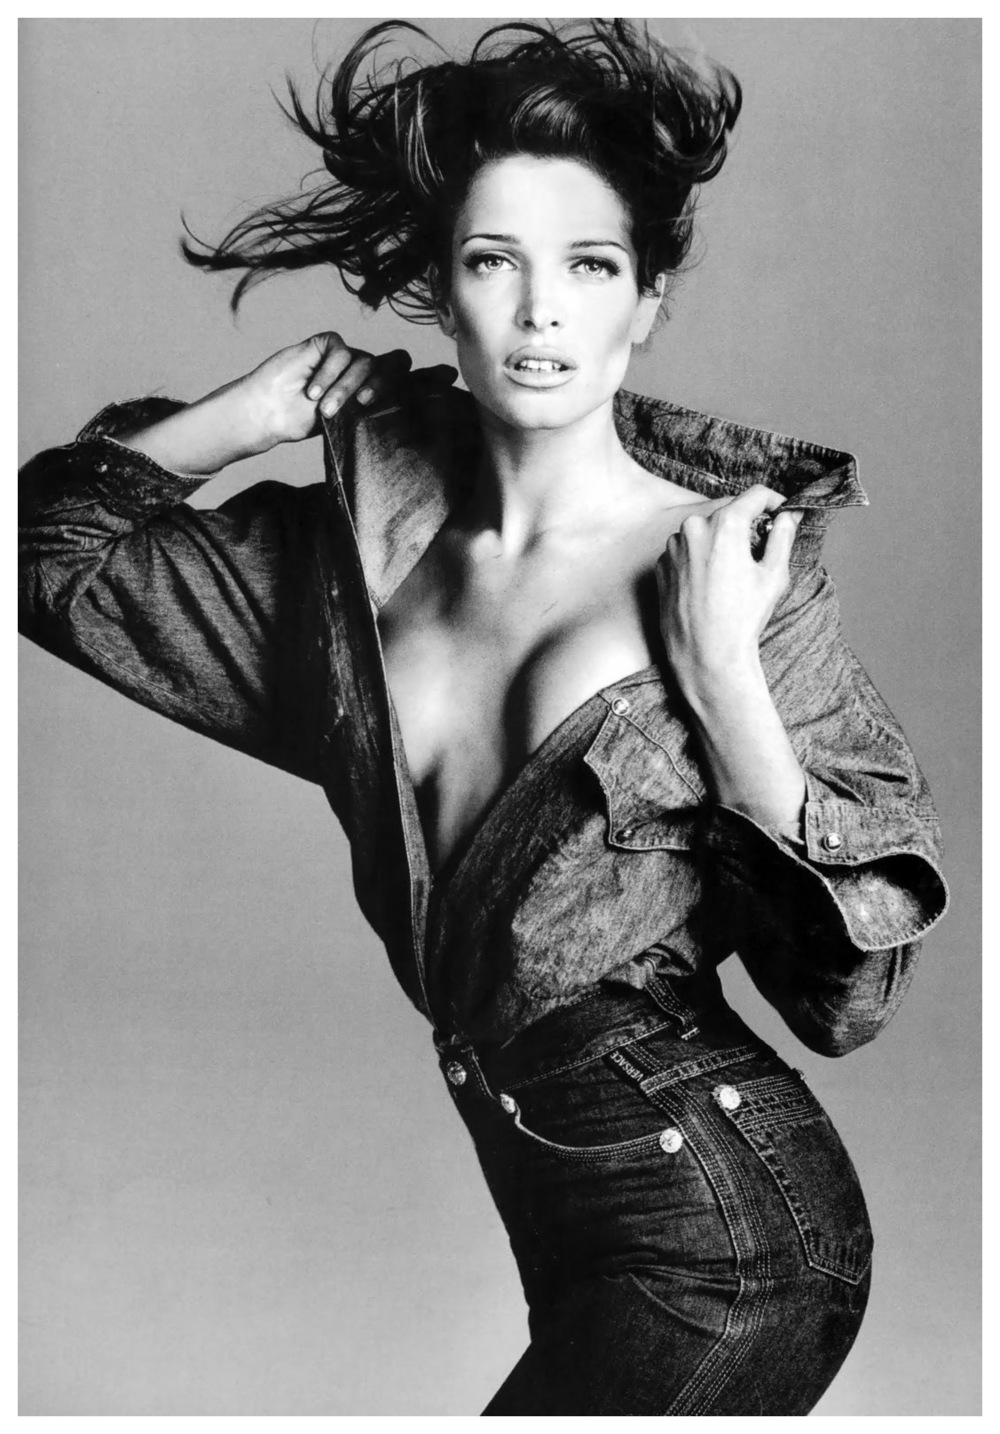 richard-avedon-stephanie-seymour-1993.jpg